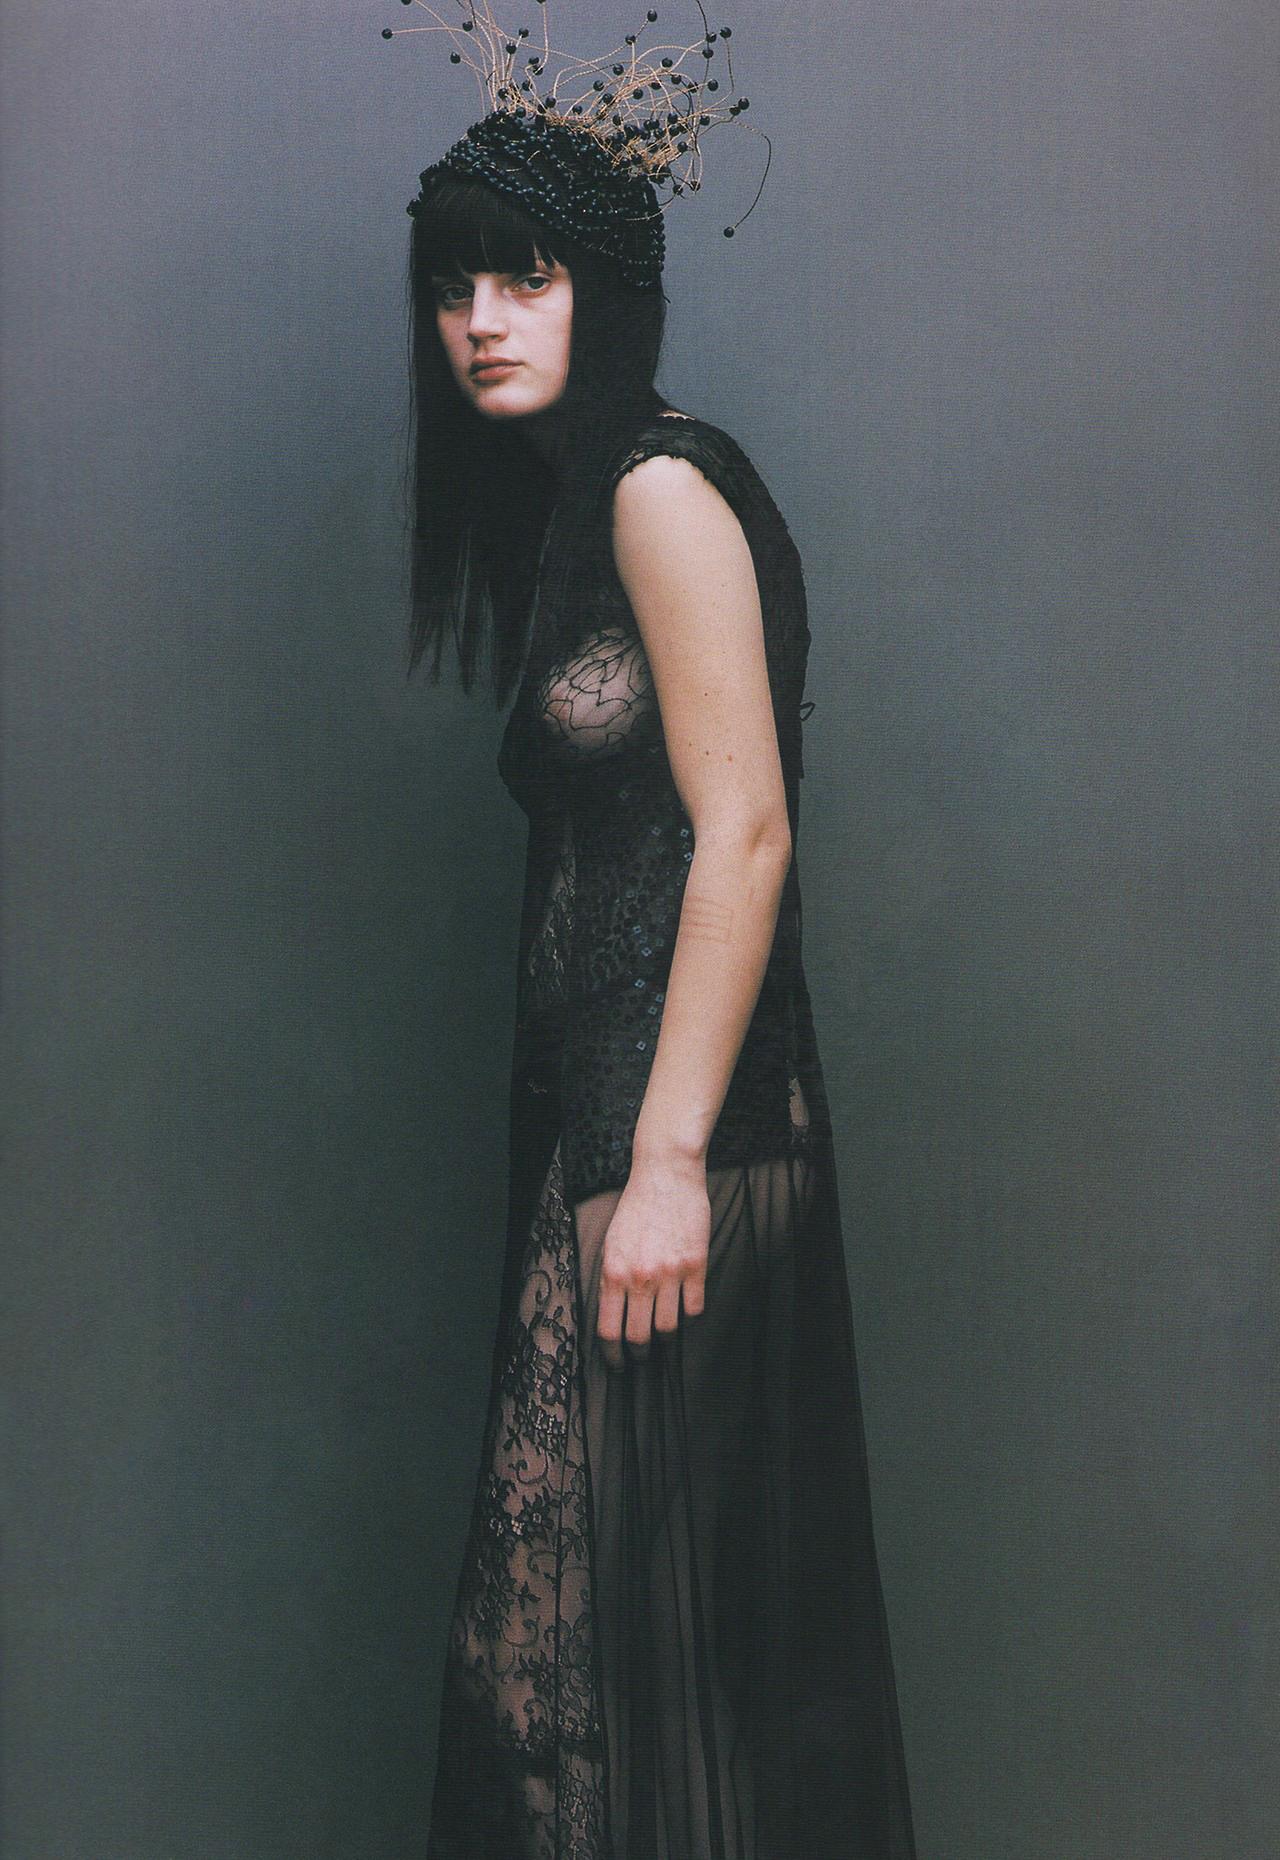 Guinevere_van_Seenus-Thomas_Schenk-Dutch-1998-02-ombresdupasse.jpg